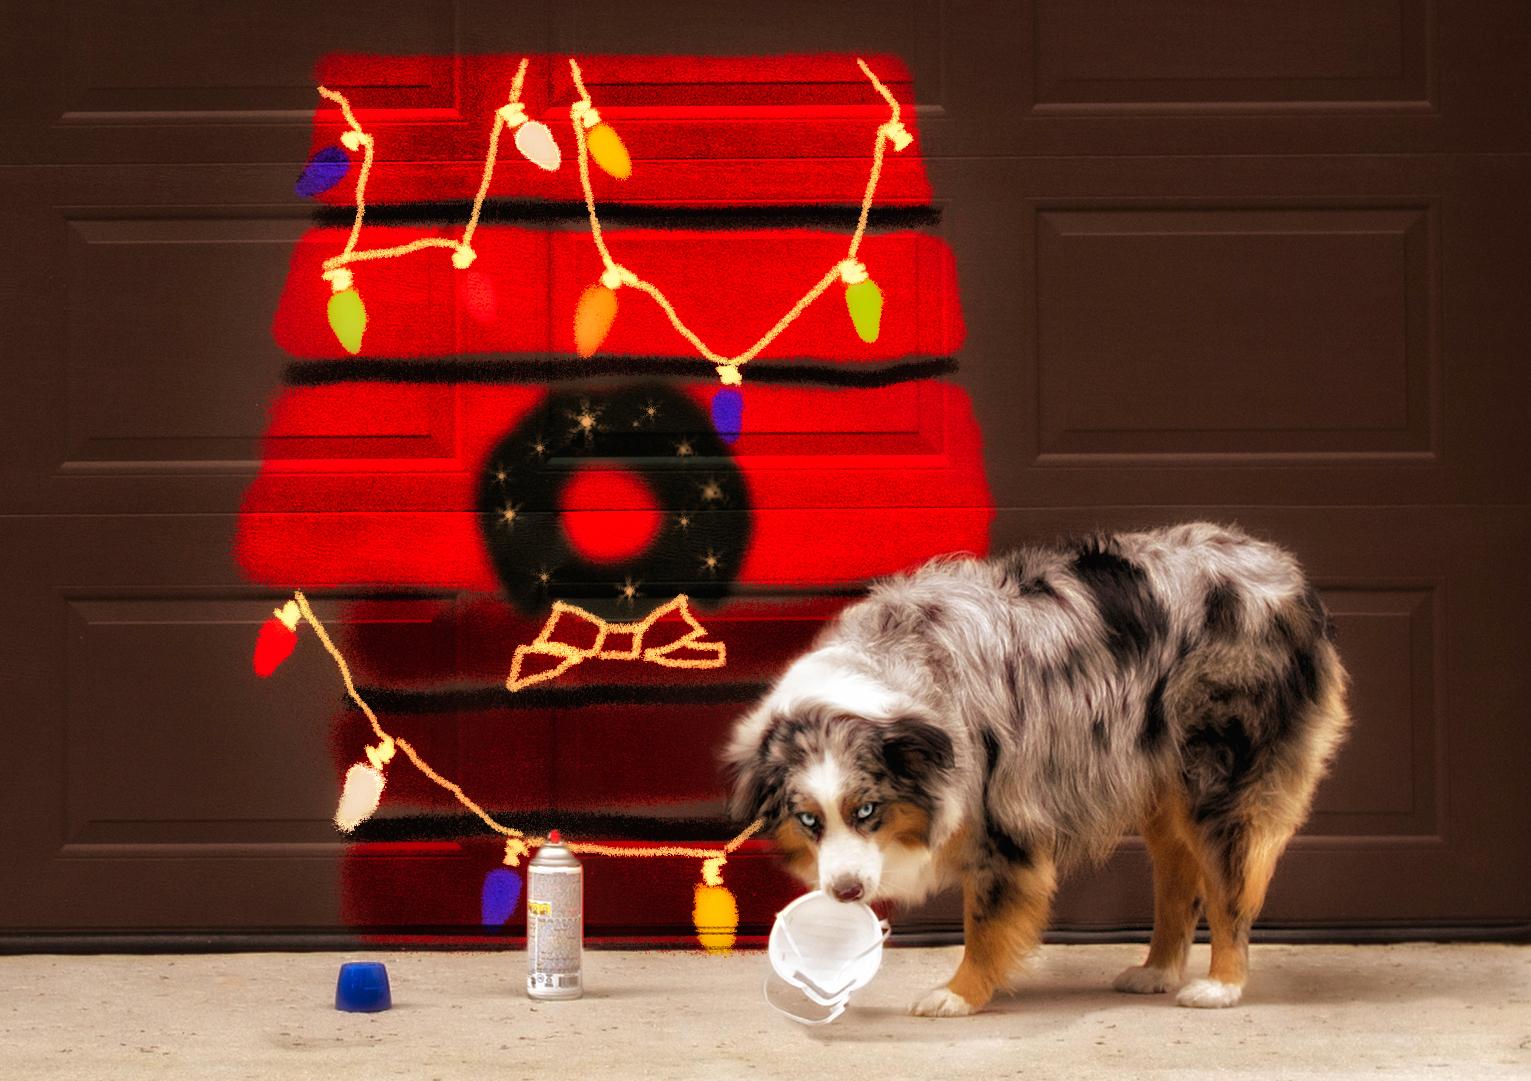 Blue sprays Snoopy on the garage door